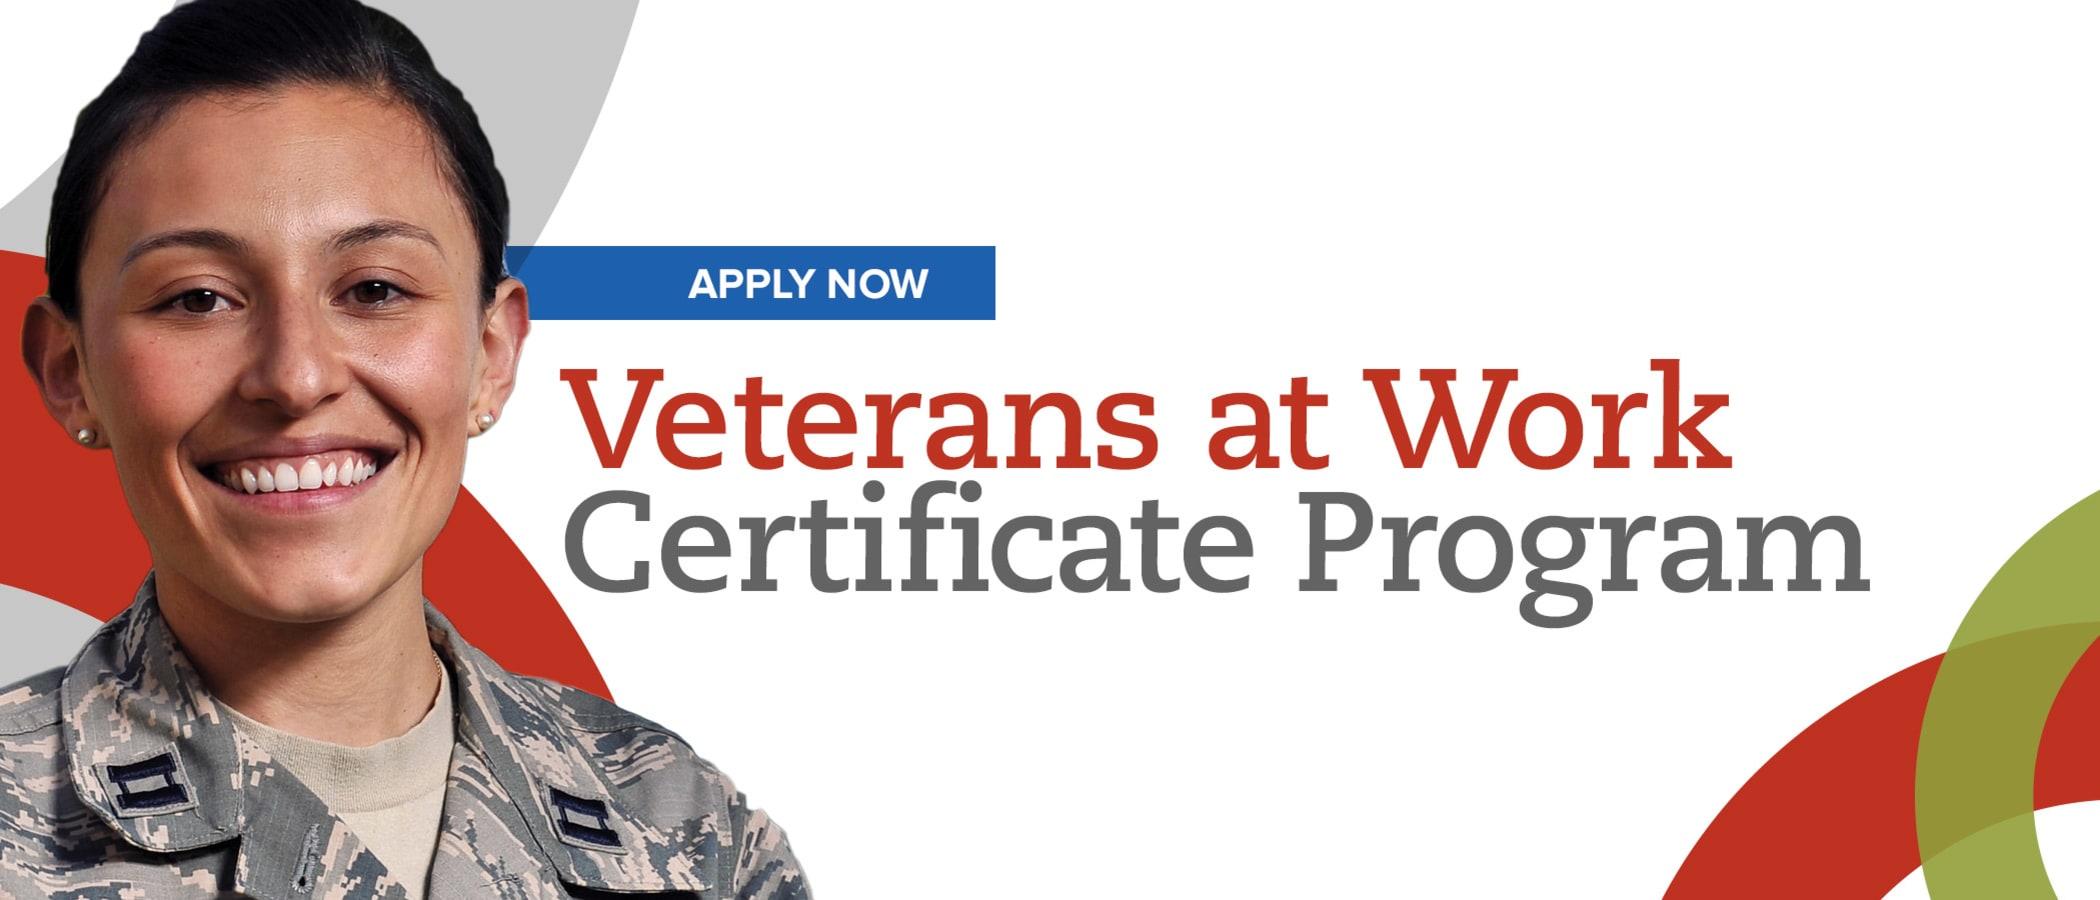 SHRM Foundation's Veterans at Work Certificate Program